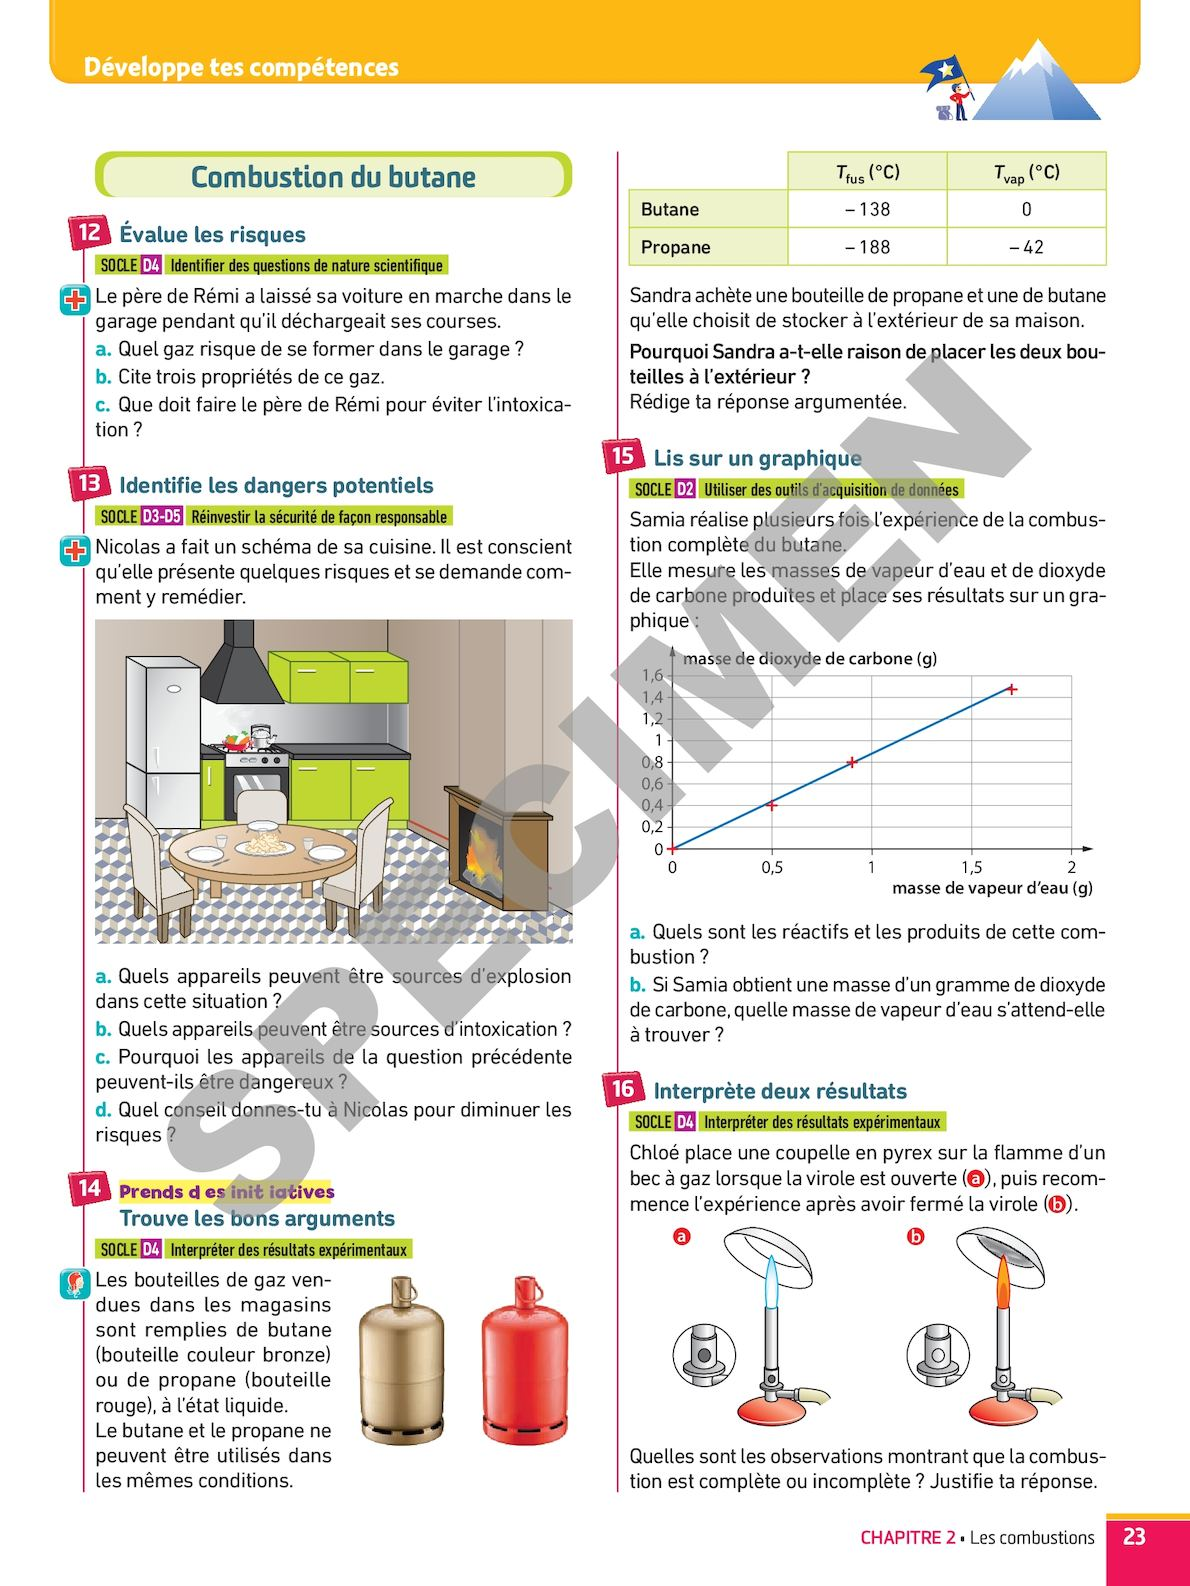 difference entre butane et propane simple patent drawing. Black Bedroom Furniture Sets. Home Design Ideas